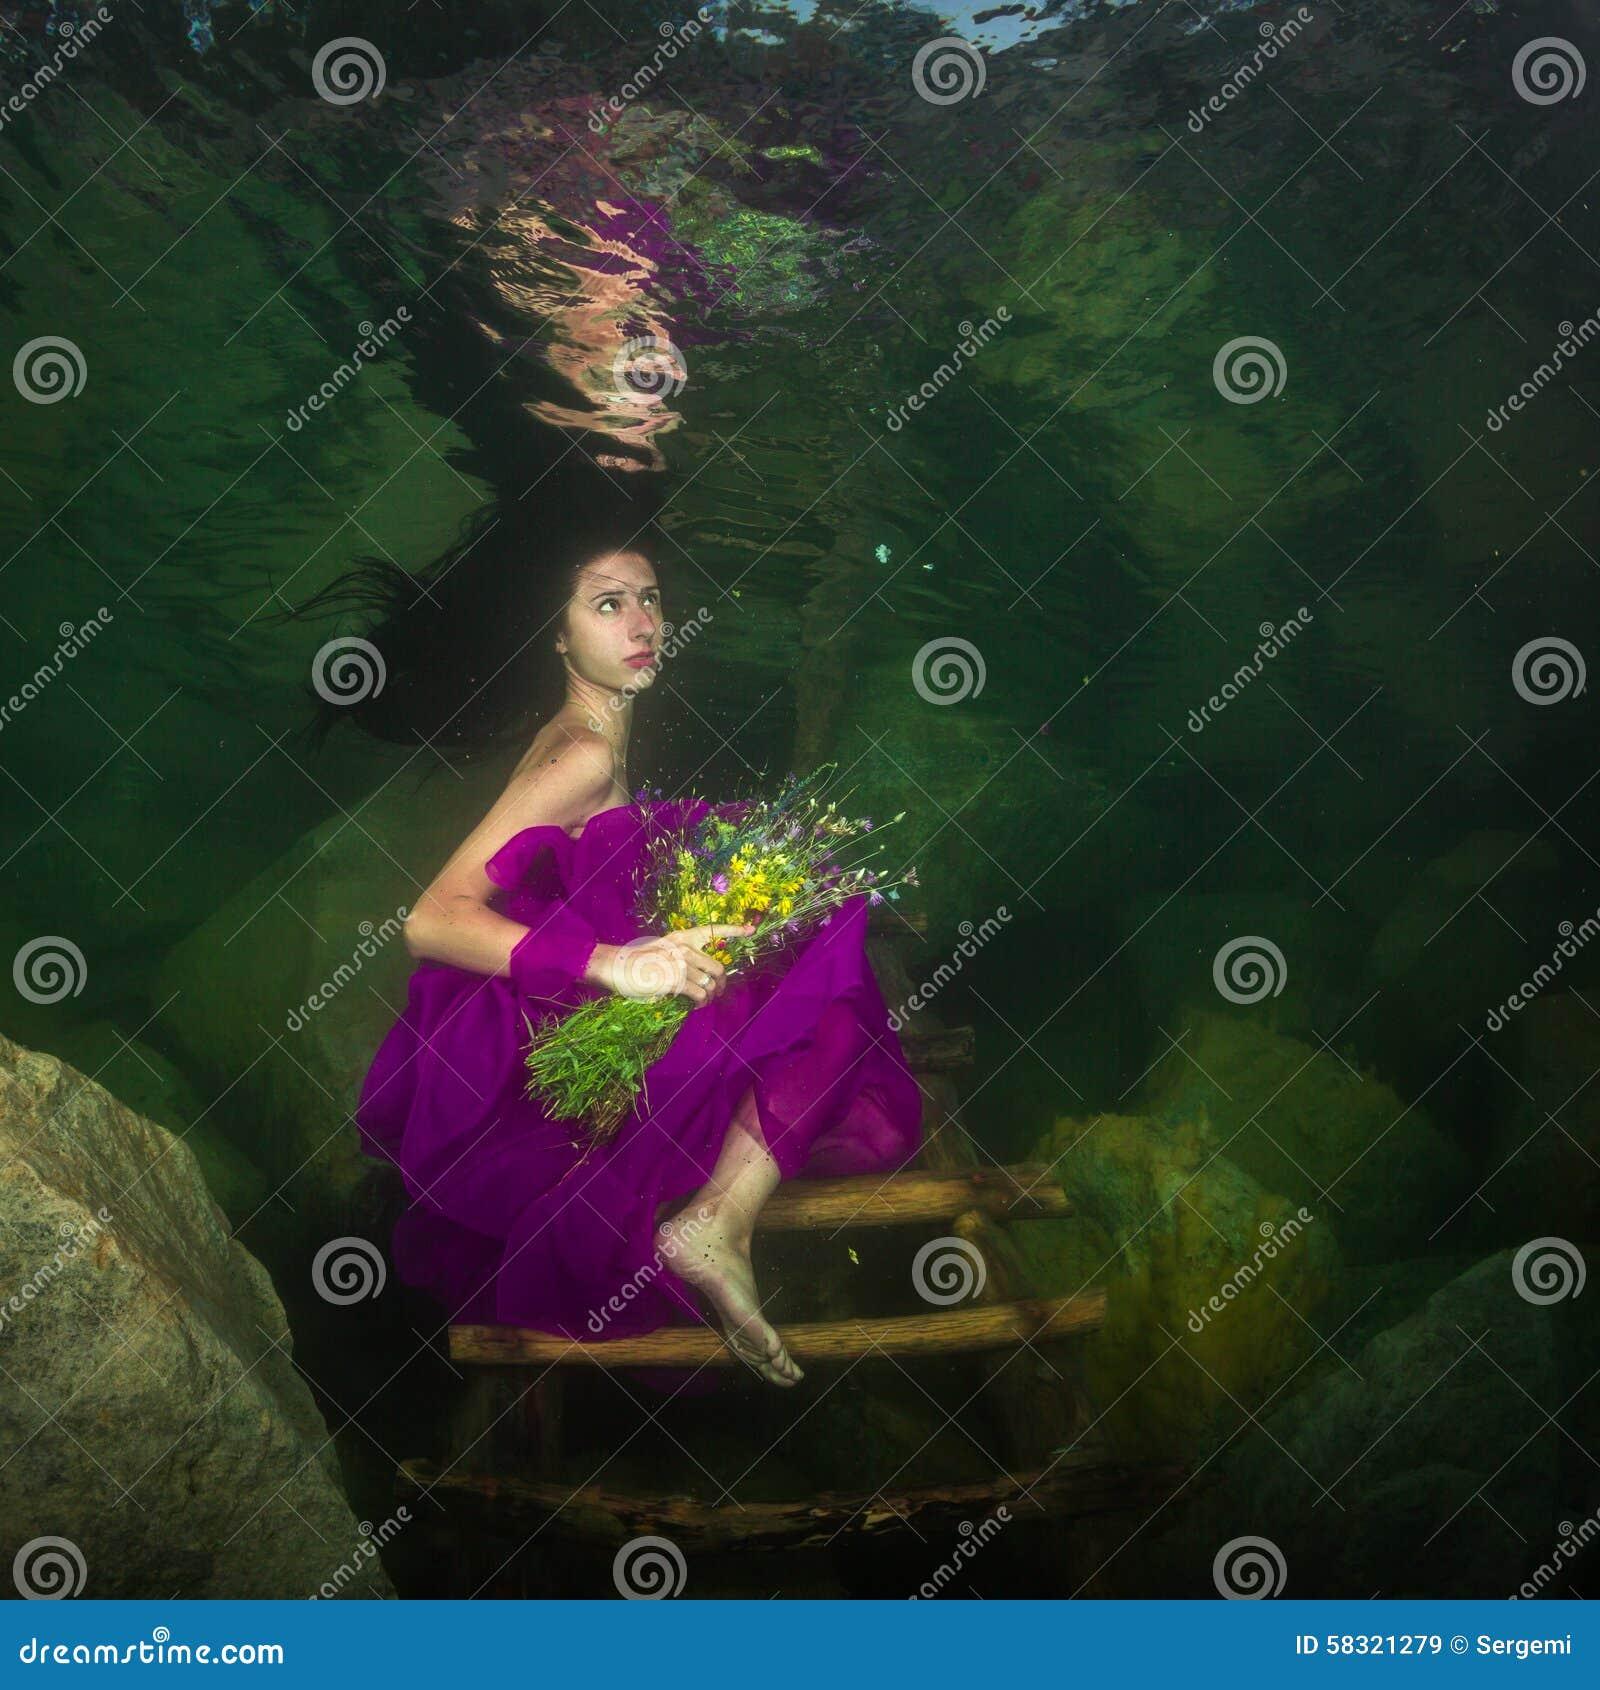 Girl in a river